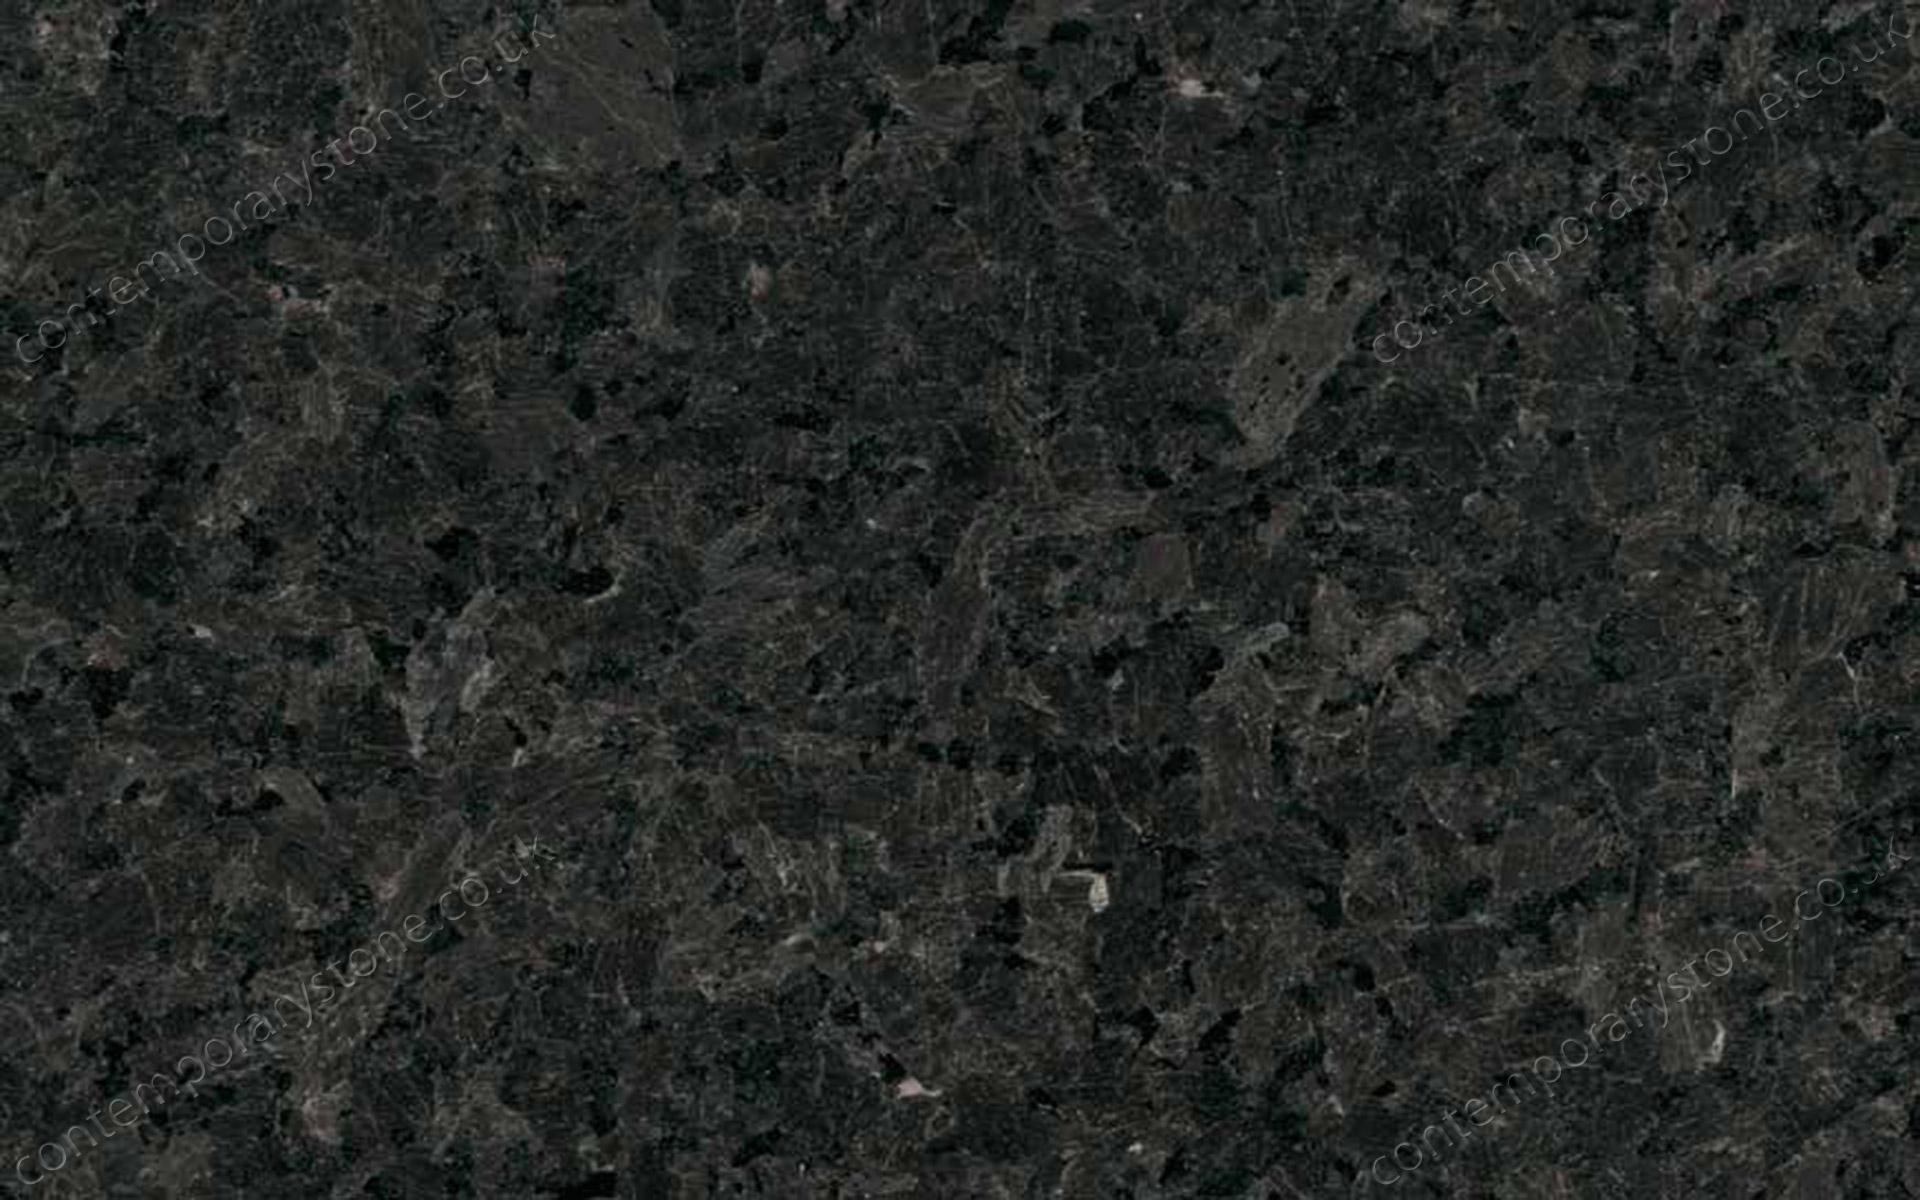 Marron Bahia granite close-up